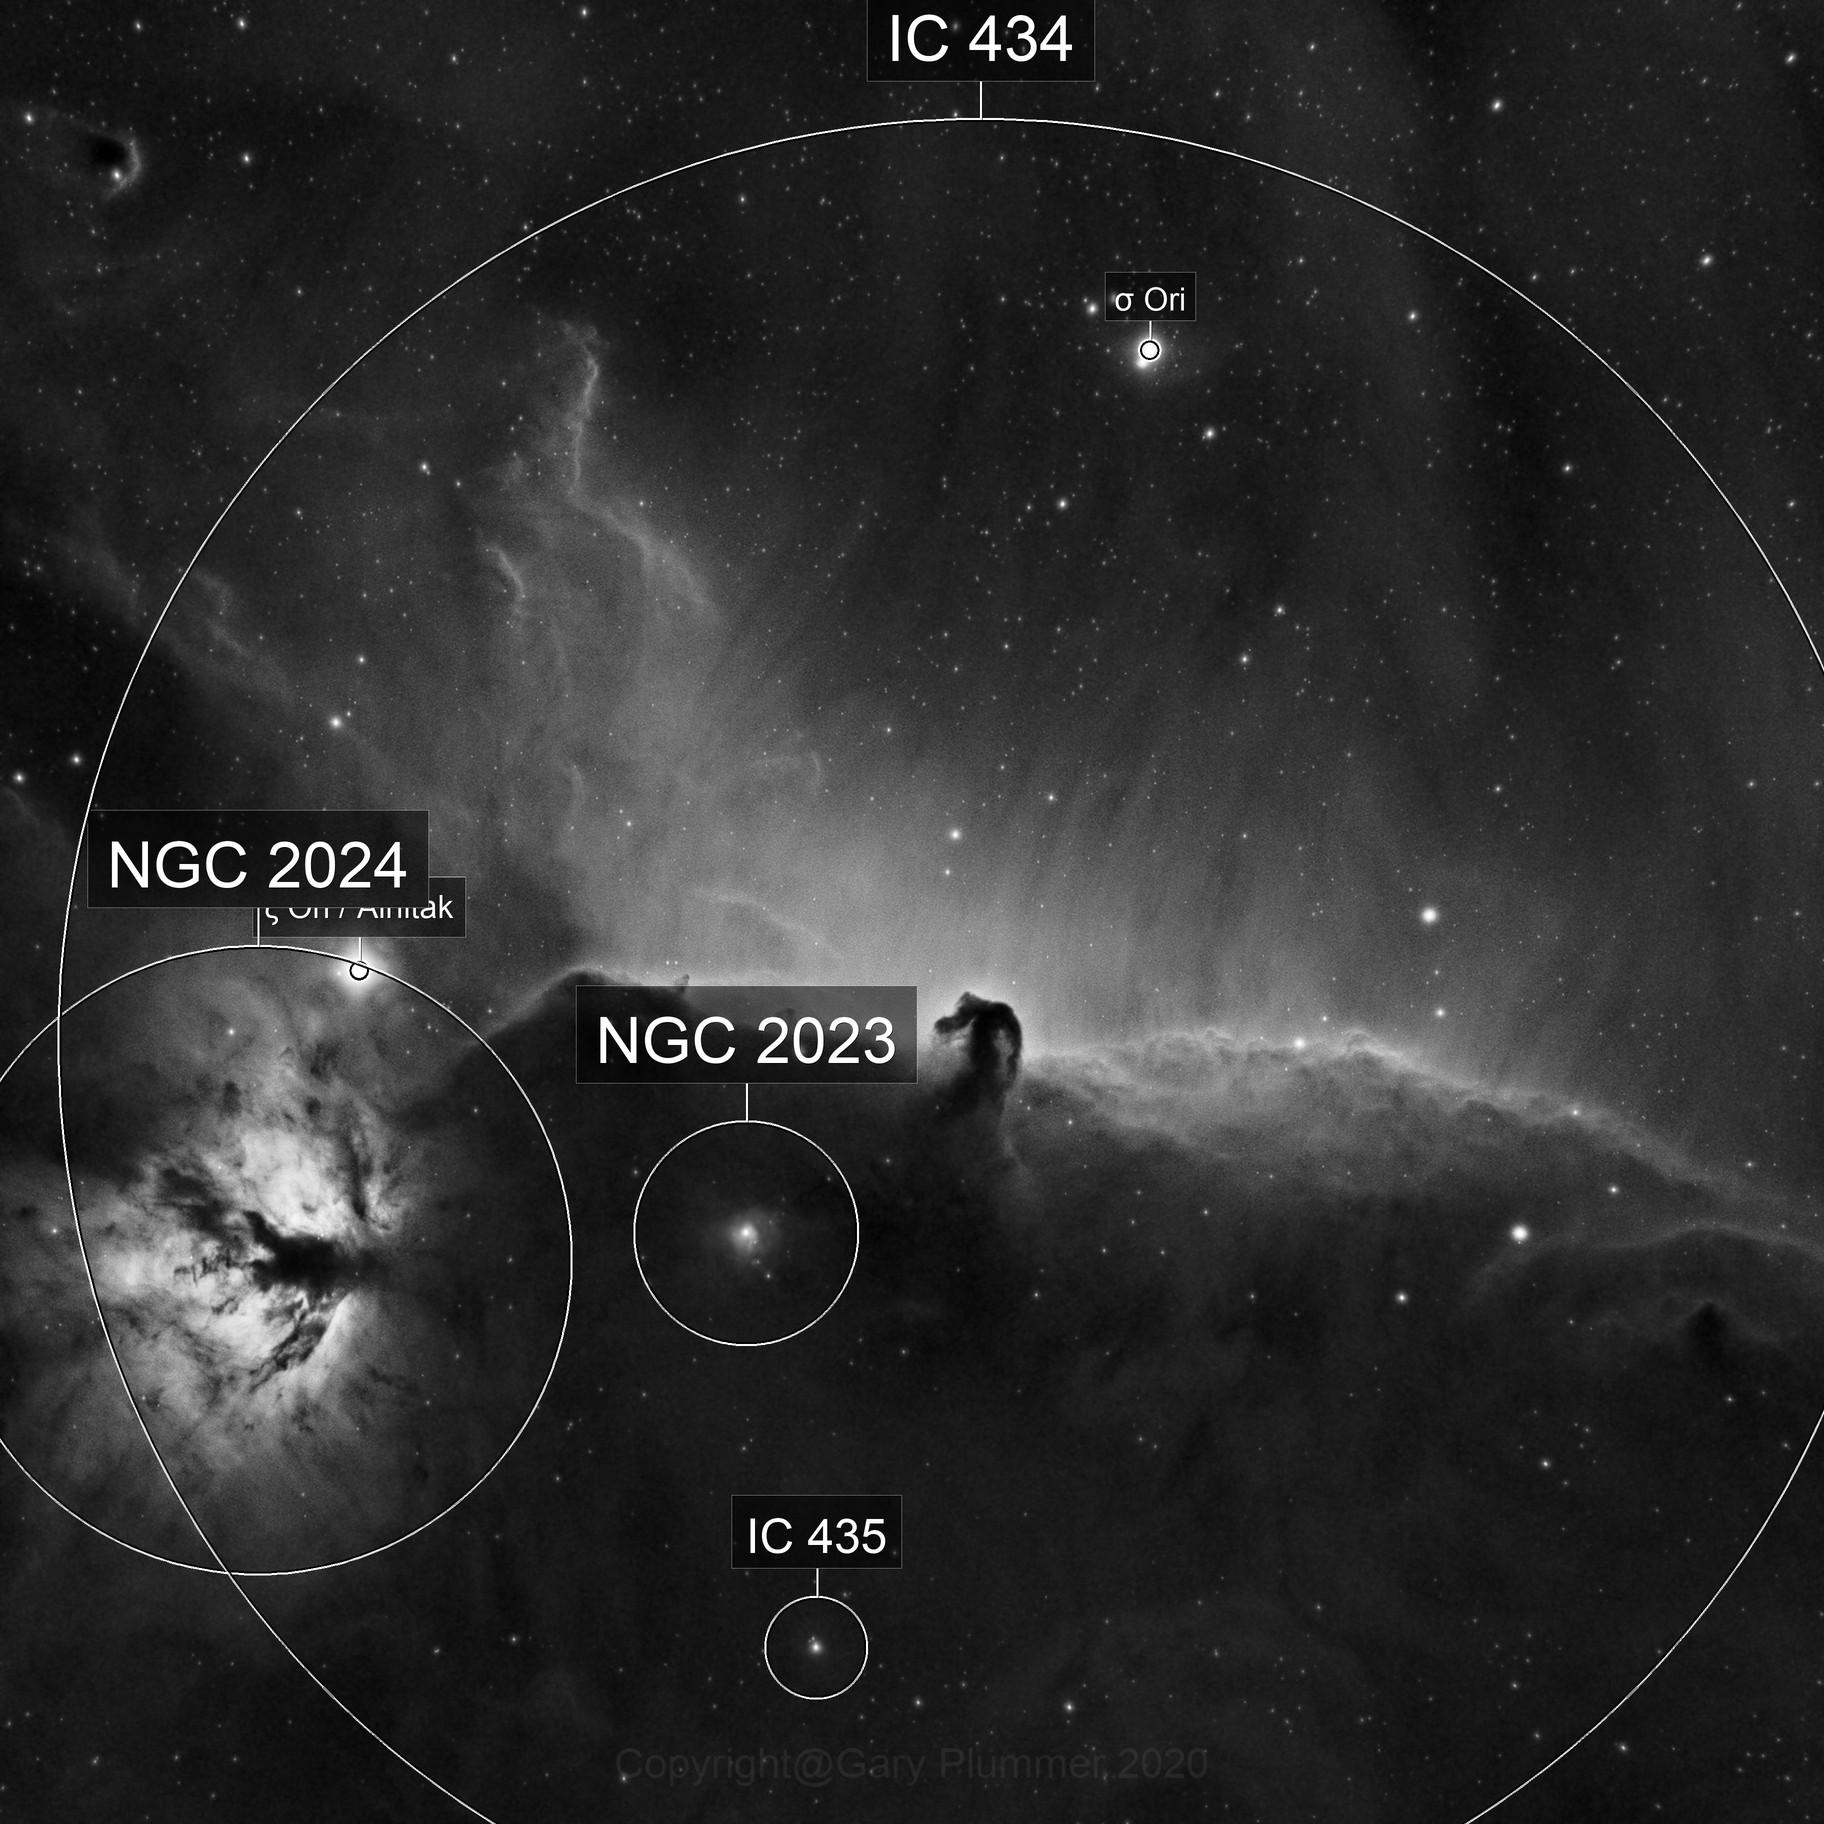 IC434 Horsehead & NGC2024 Flame Nebulae